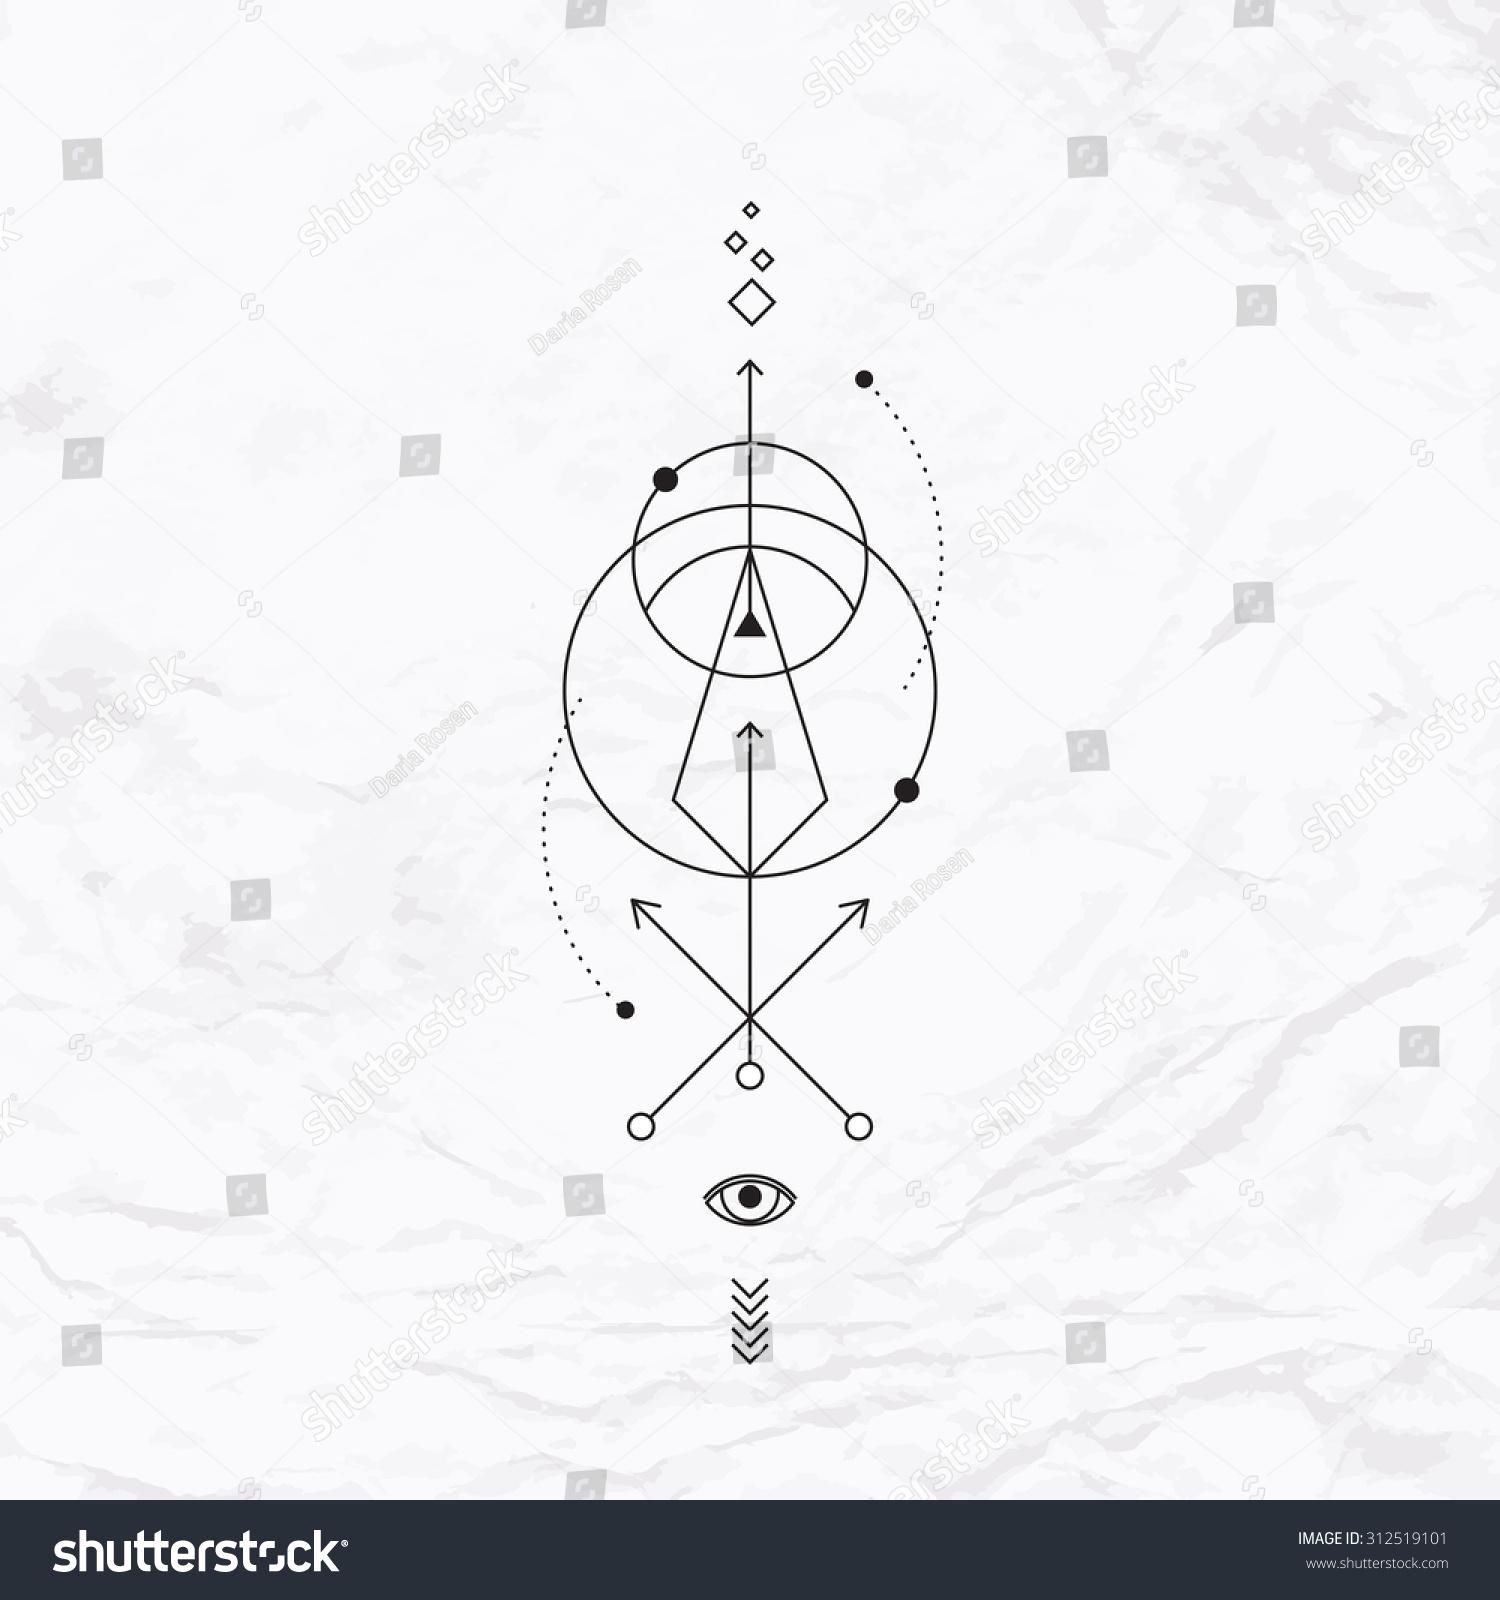 vector geometric alchemy symbol eye circle stock vector 312519101 shutterstock. Black Bedroom Furniture Sets. Home Design Ideas